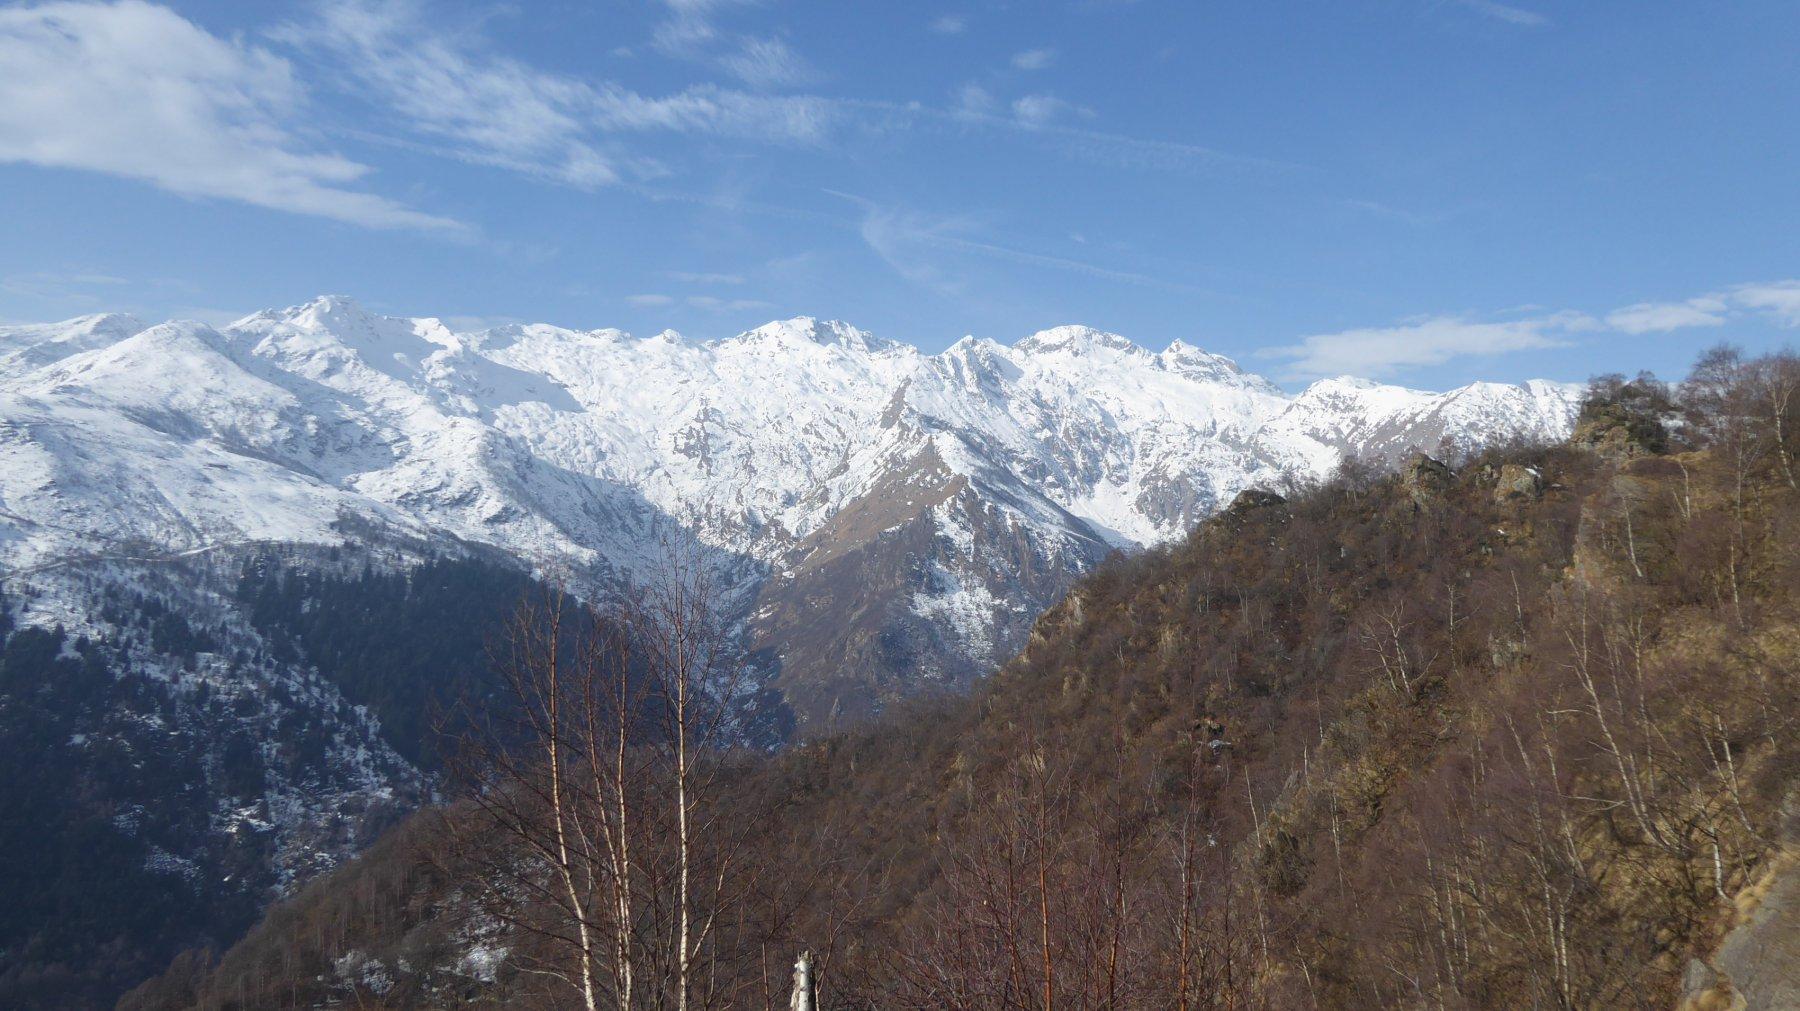 Le montagne innevate dell'Invers